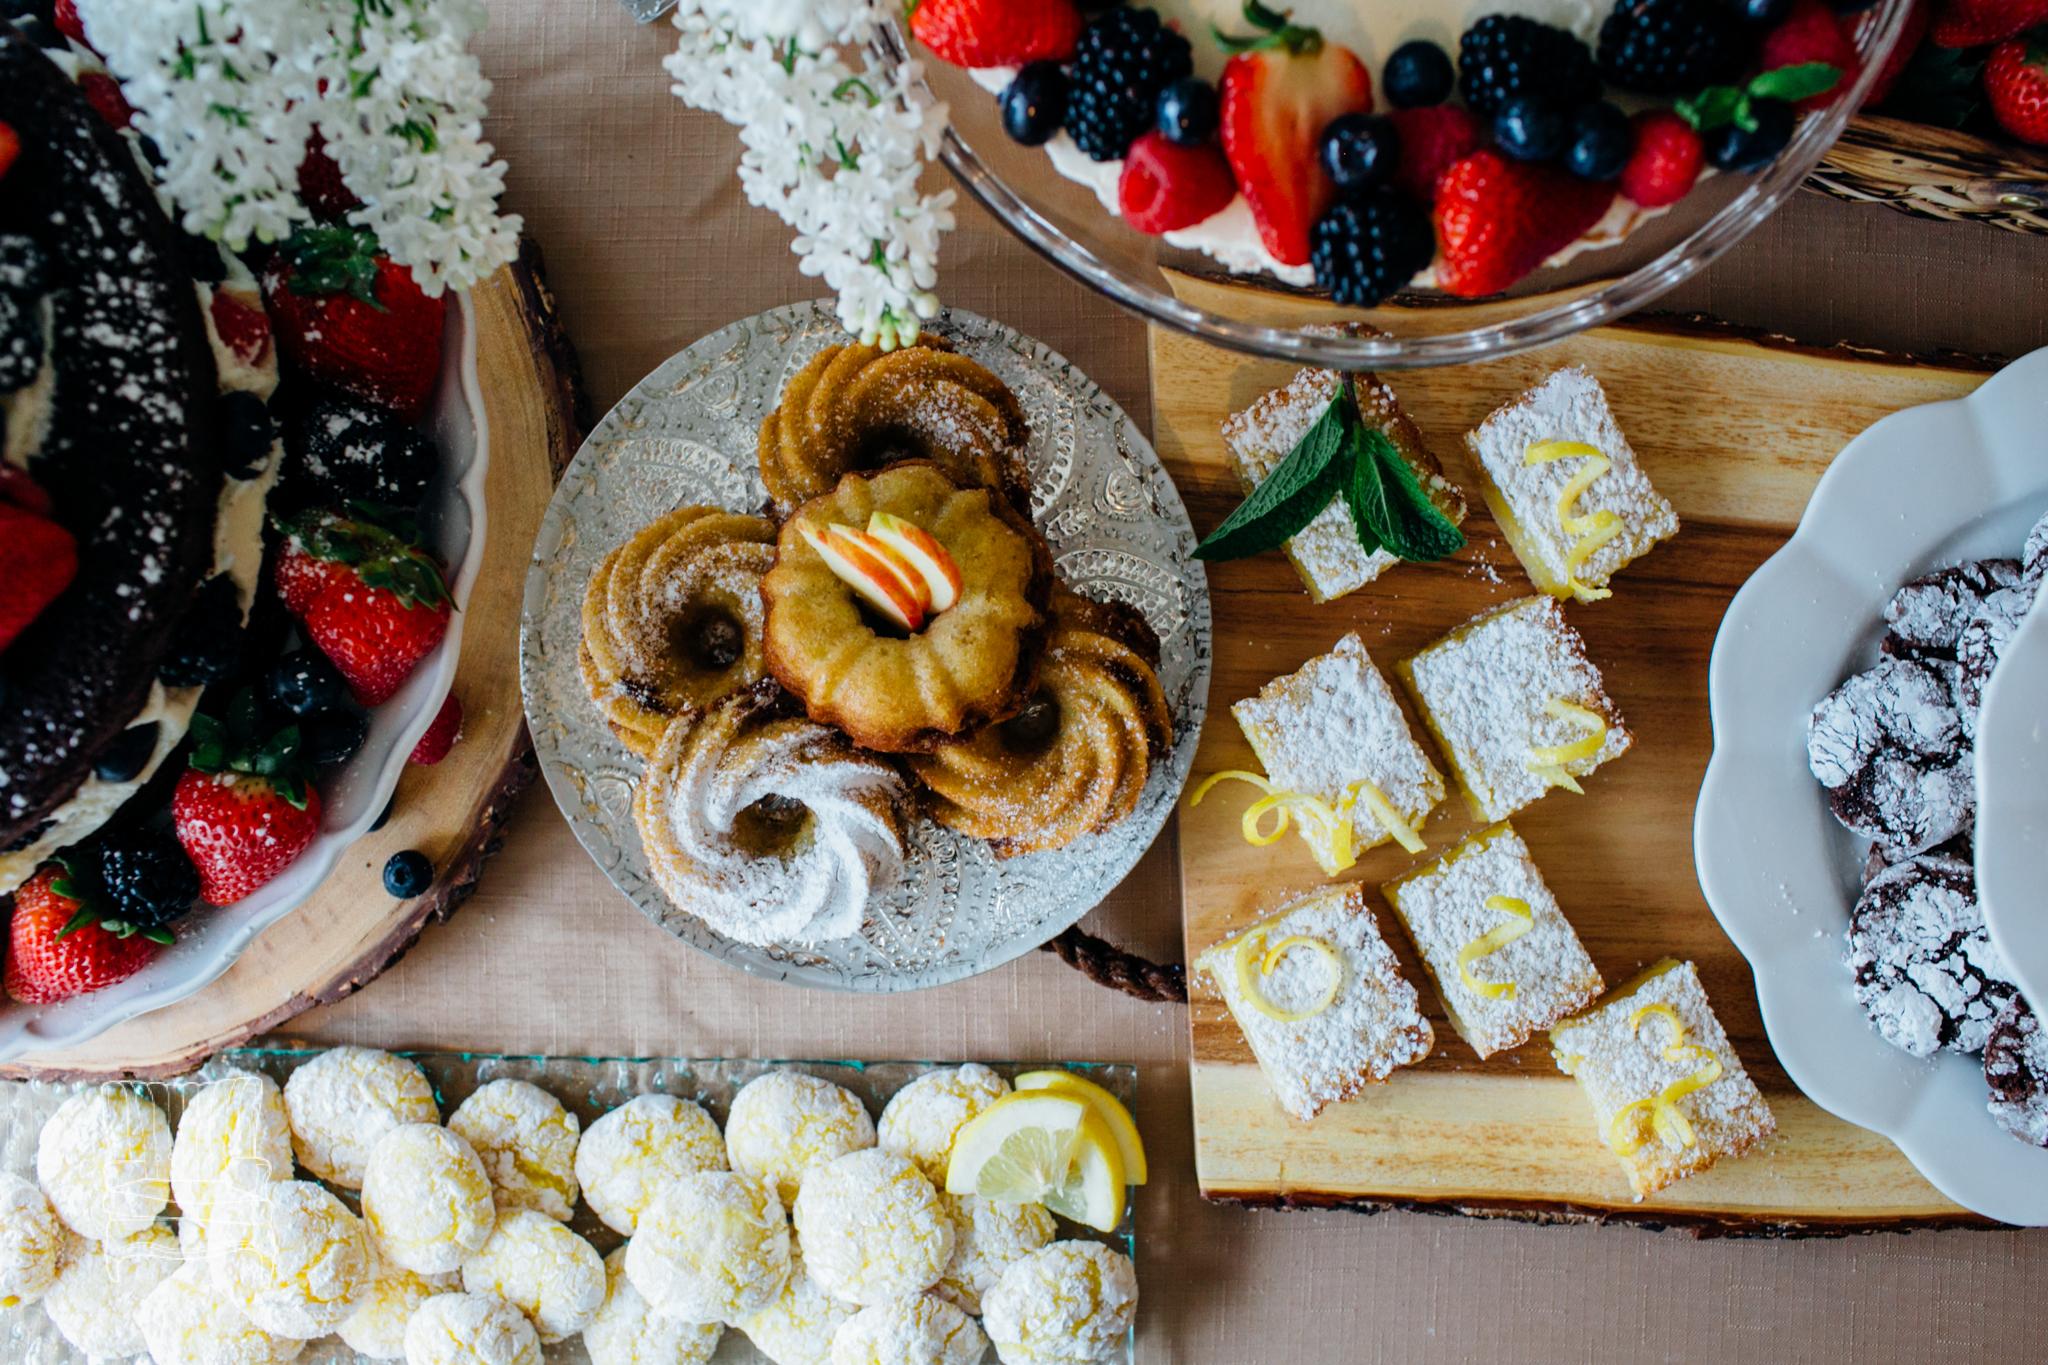 bellingham-food-marketing-photography-photo-4.jpg